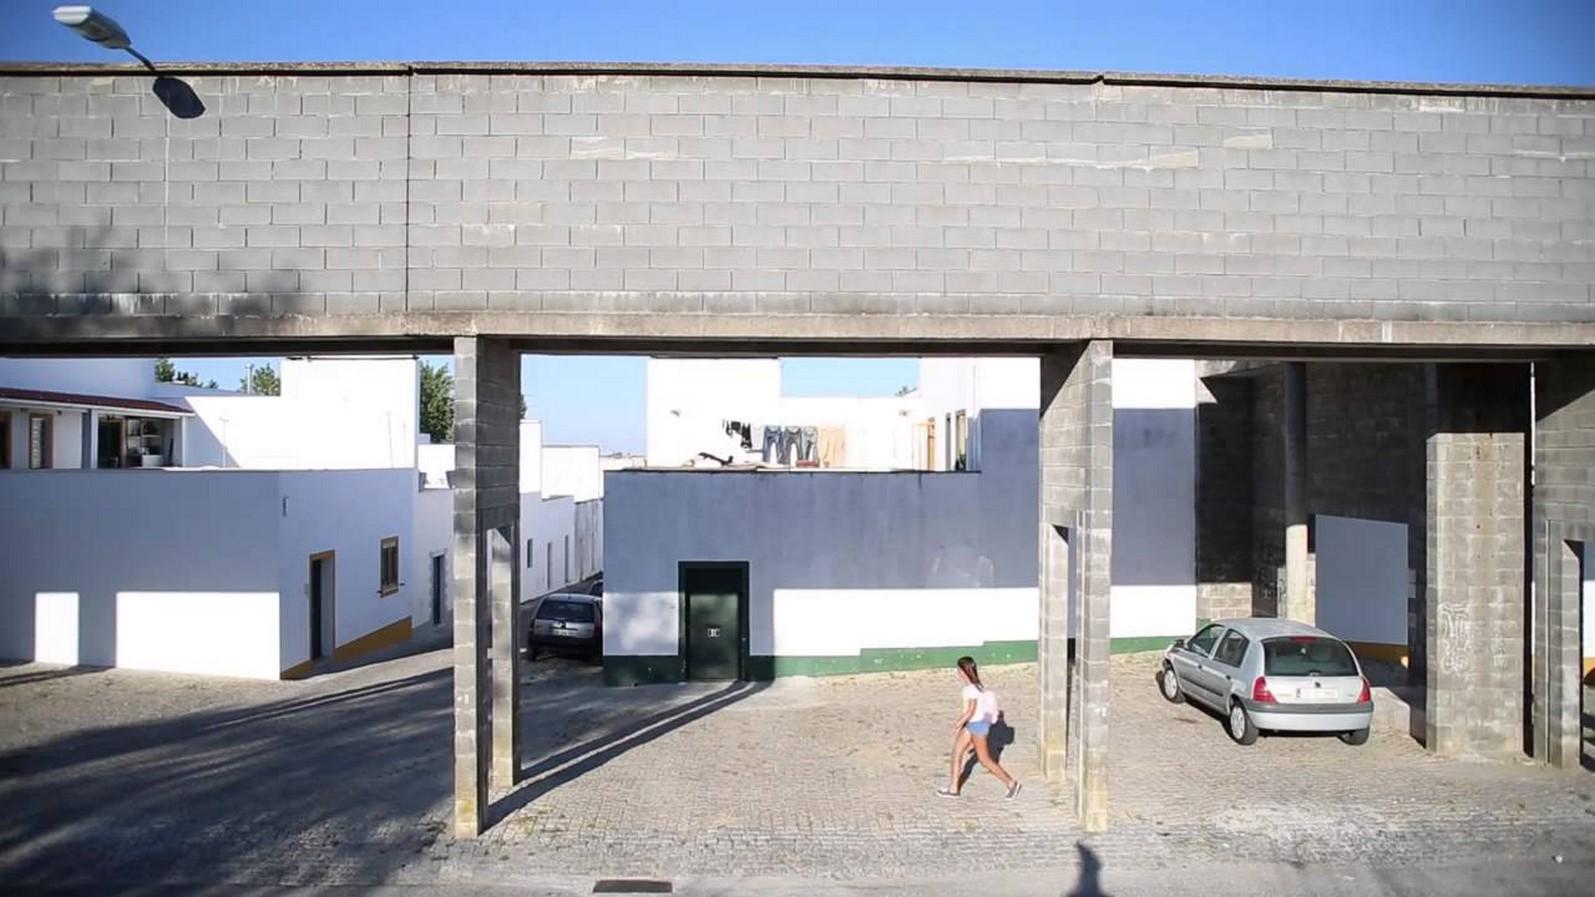 The Malagueira Housing Project, Alvaro Siza, 1977 - Sheet5